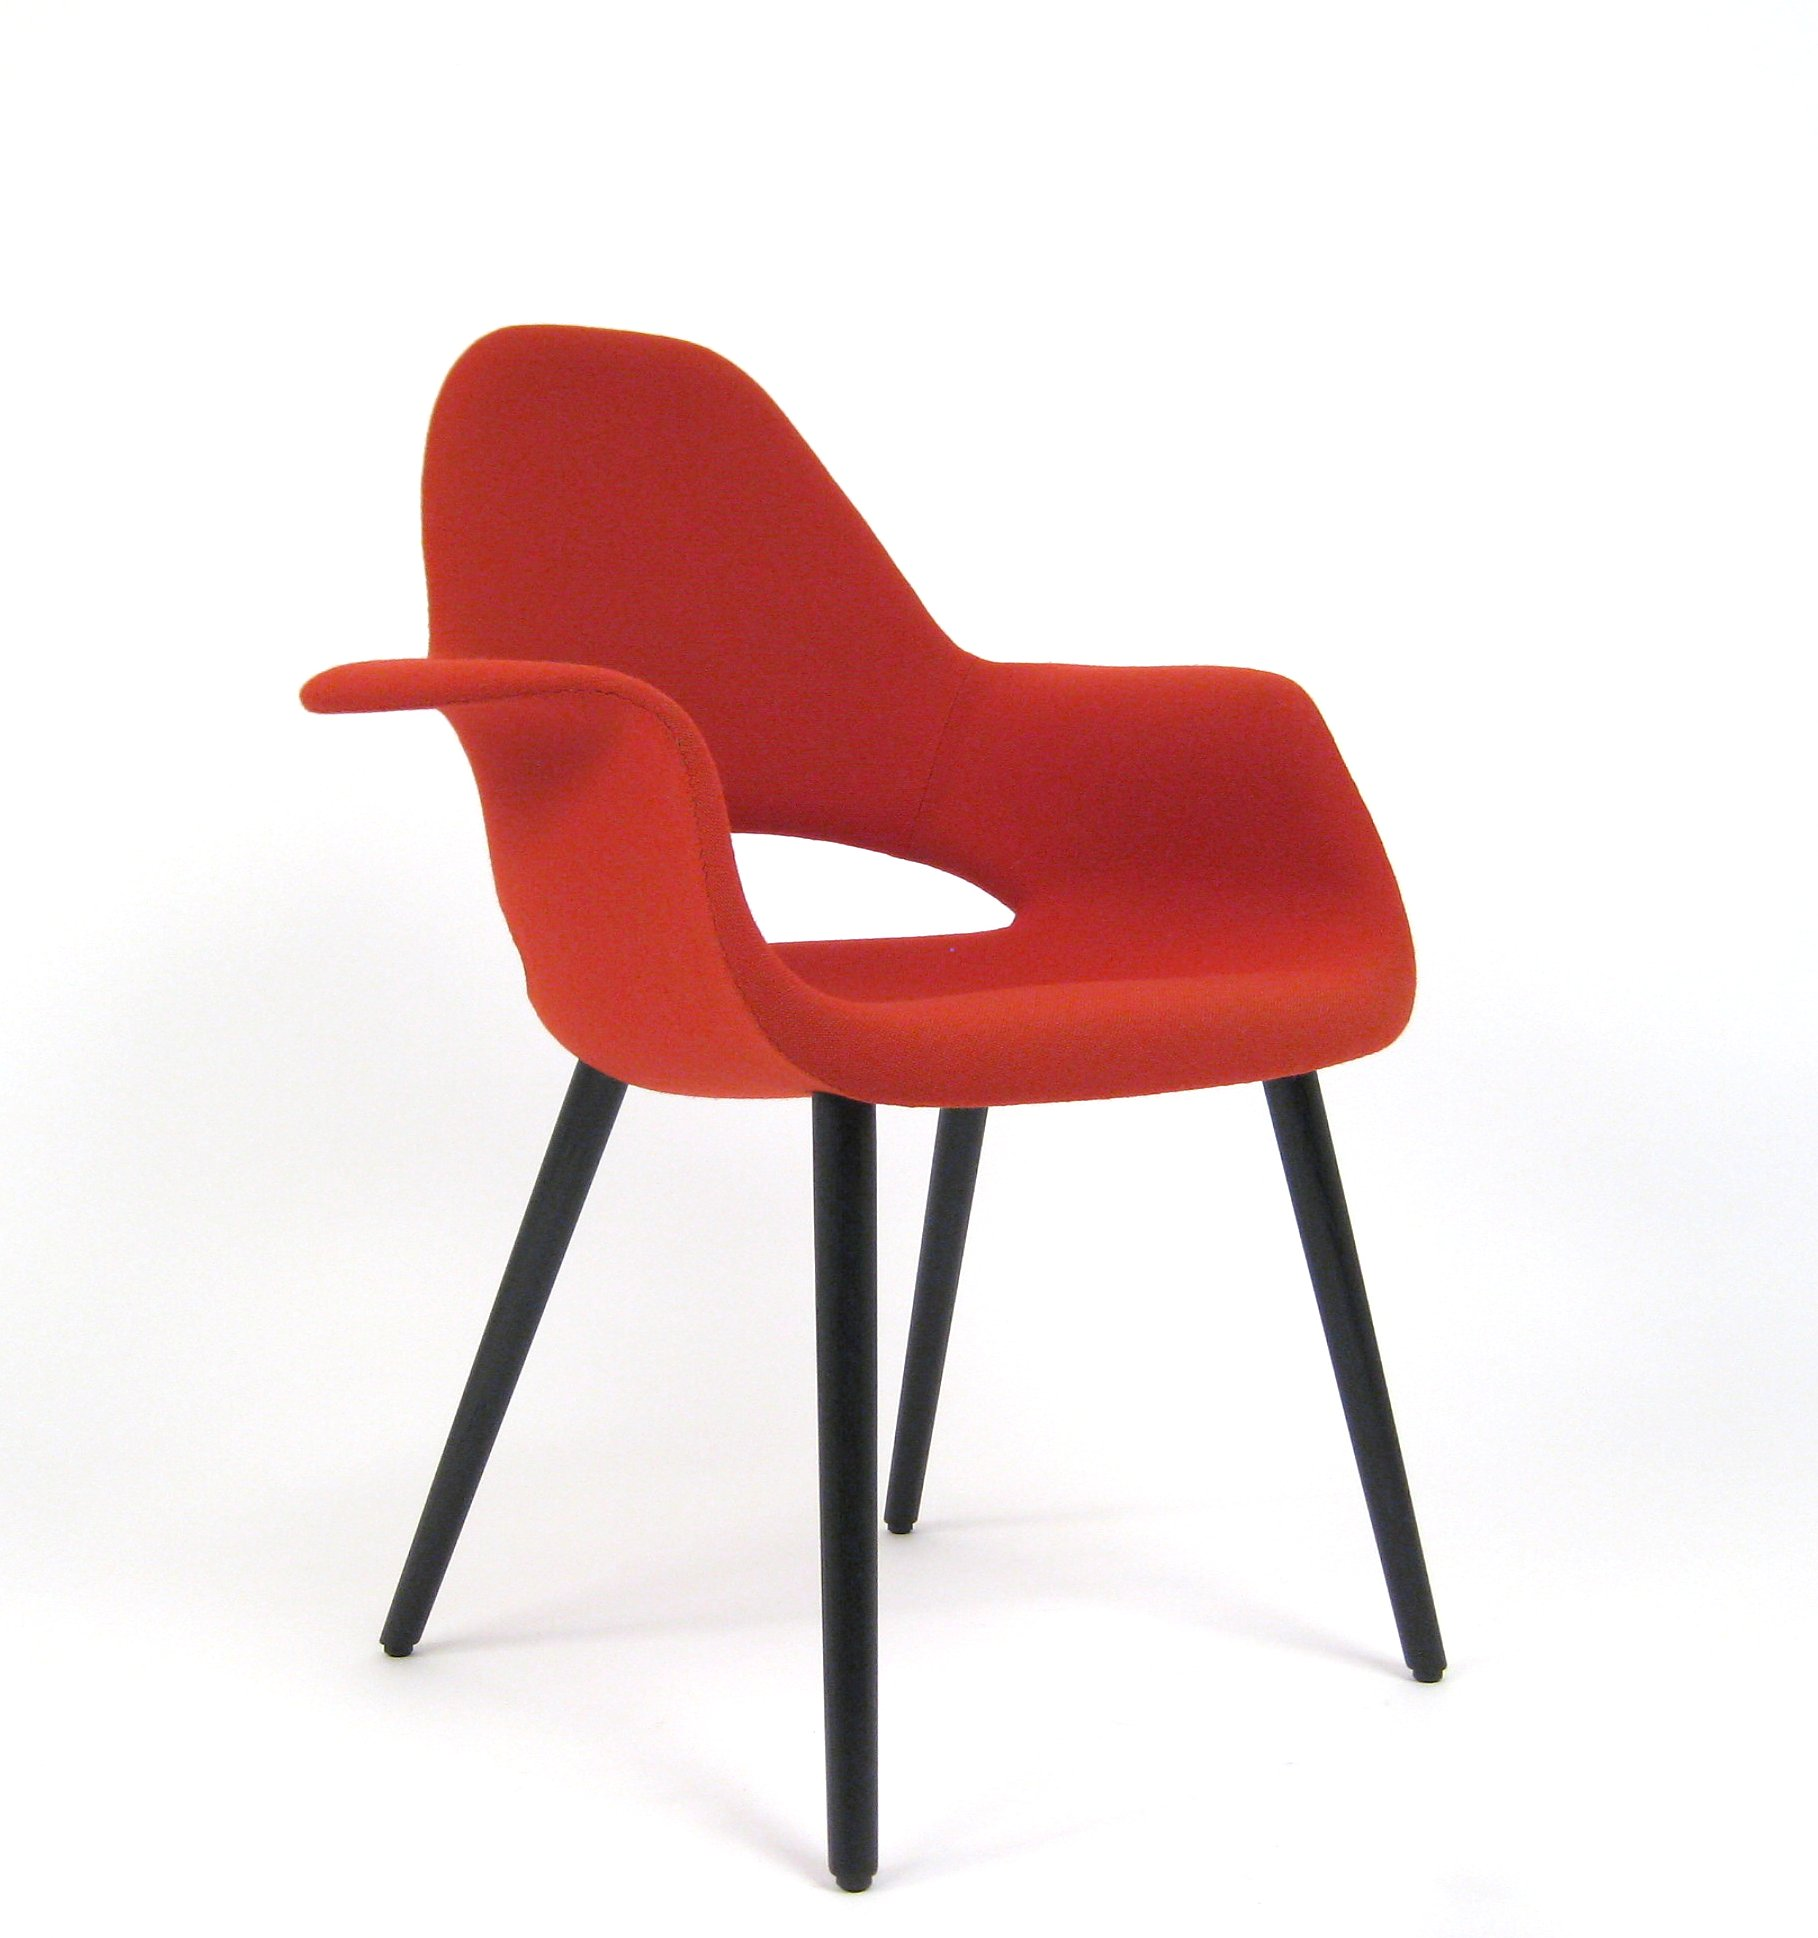 stunning charles eames u eero saarinen stuhl modell organic conference chair von vitra lauritz with saarinen stuhl